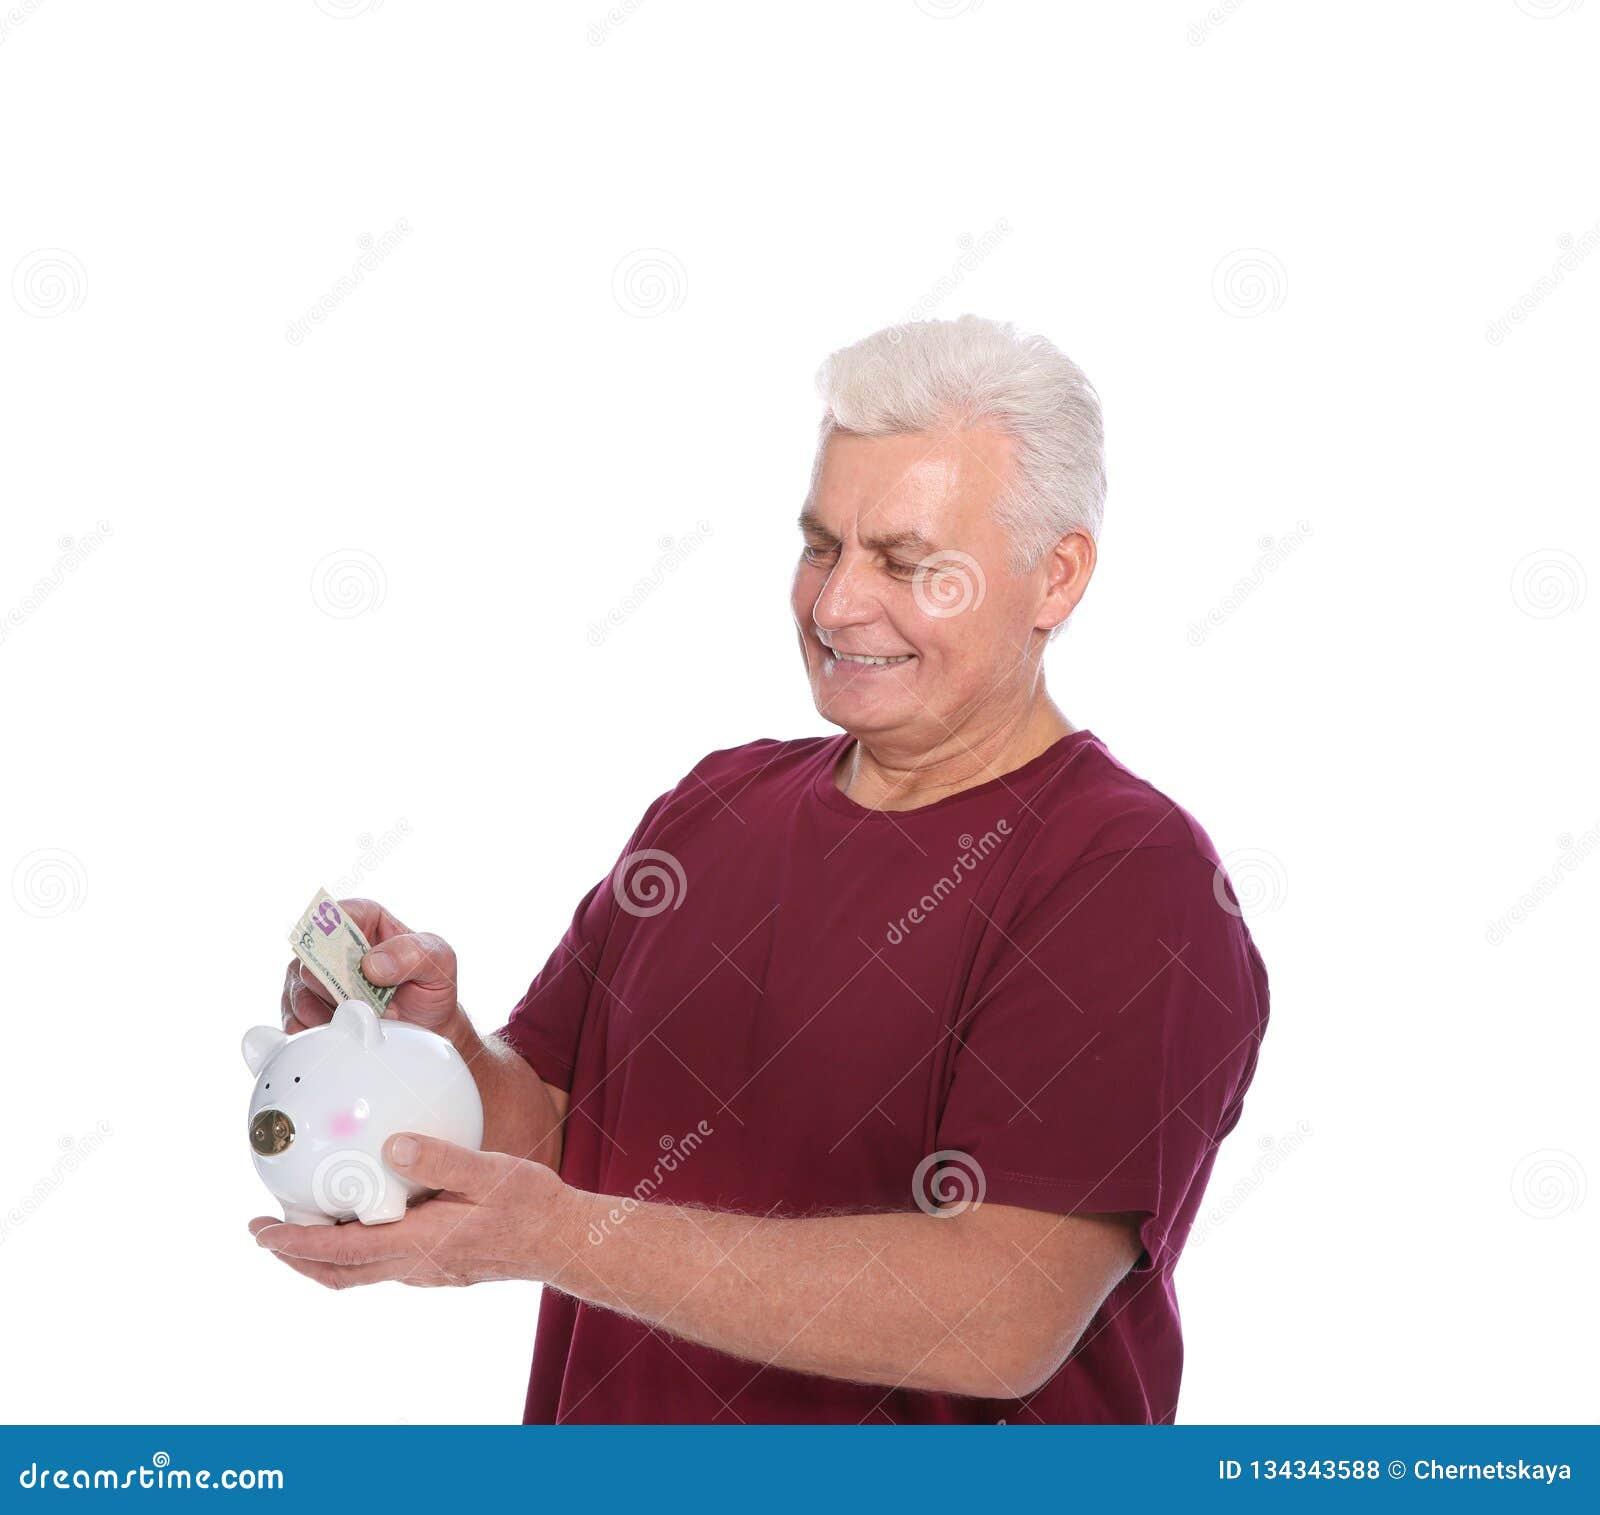 Mature man putting money into piggy bank